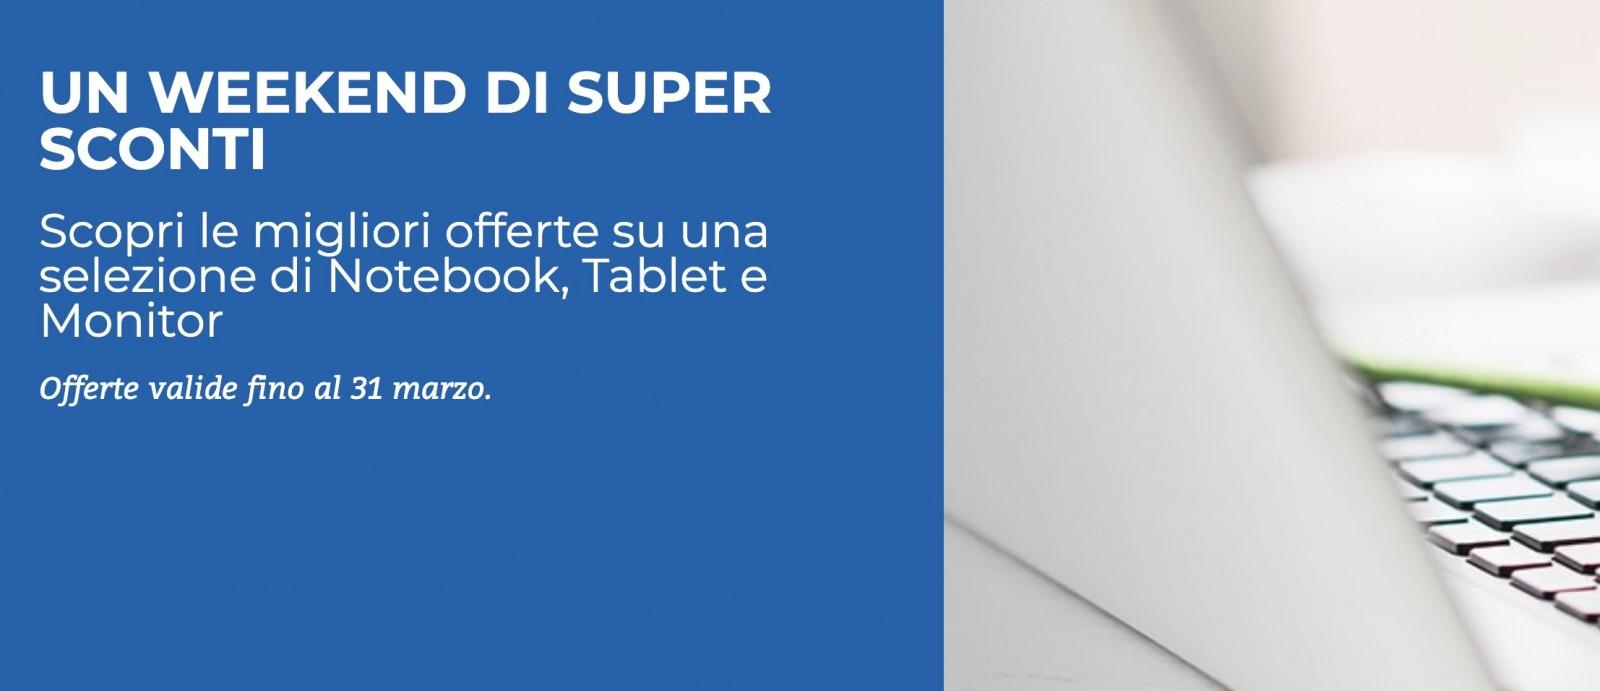 "Unieuro ""Weekend Super Sconti"" dal 29-31 Marzo"